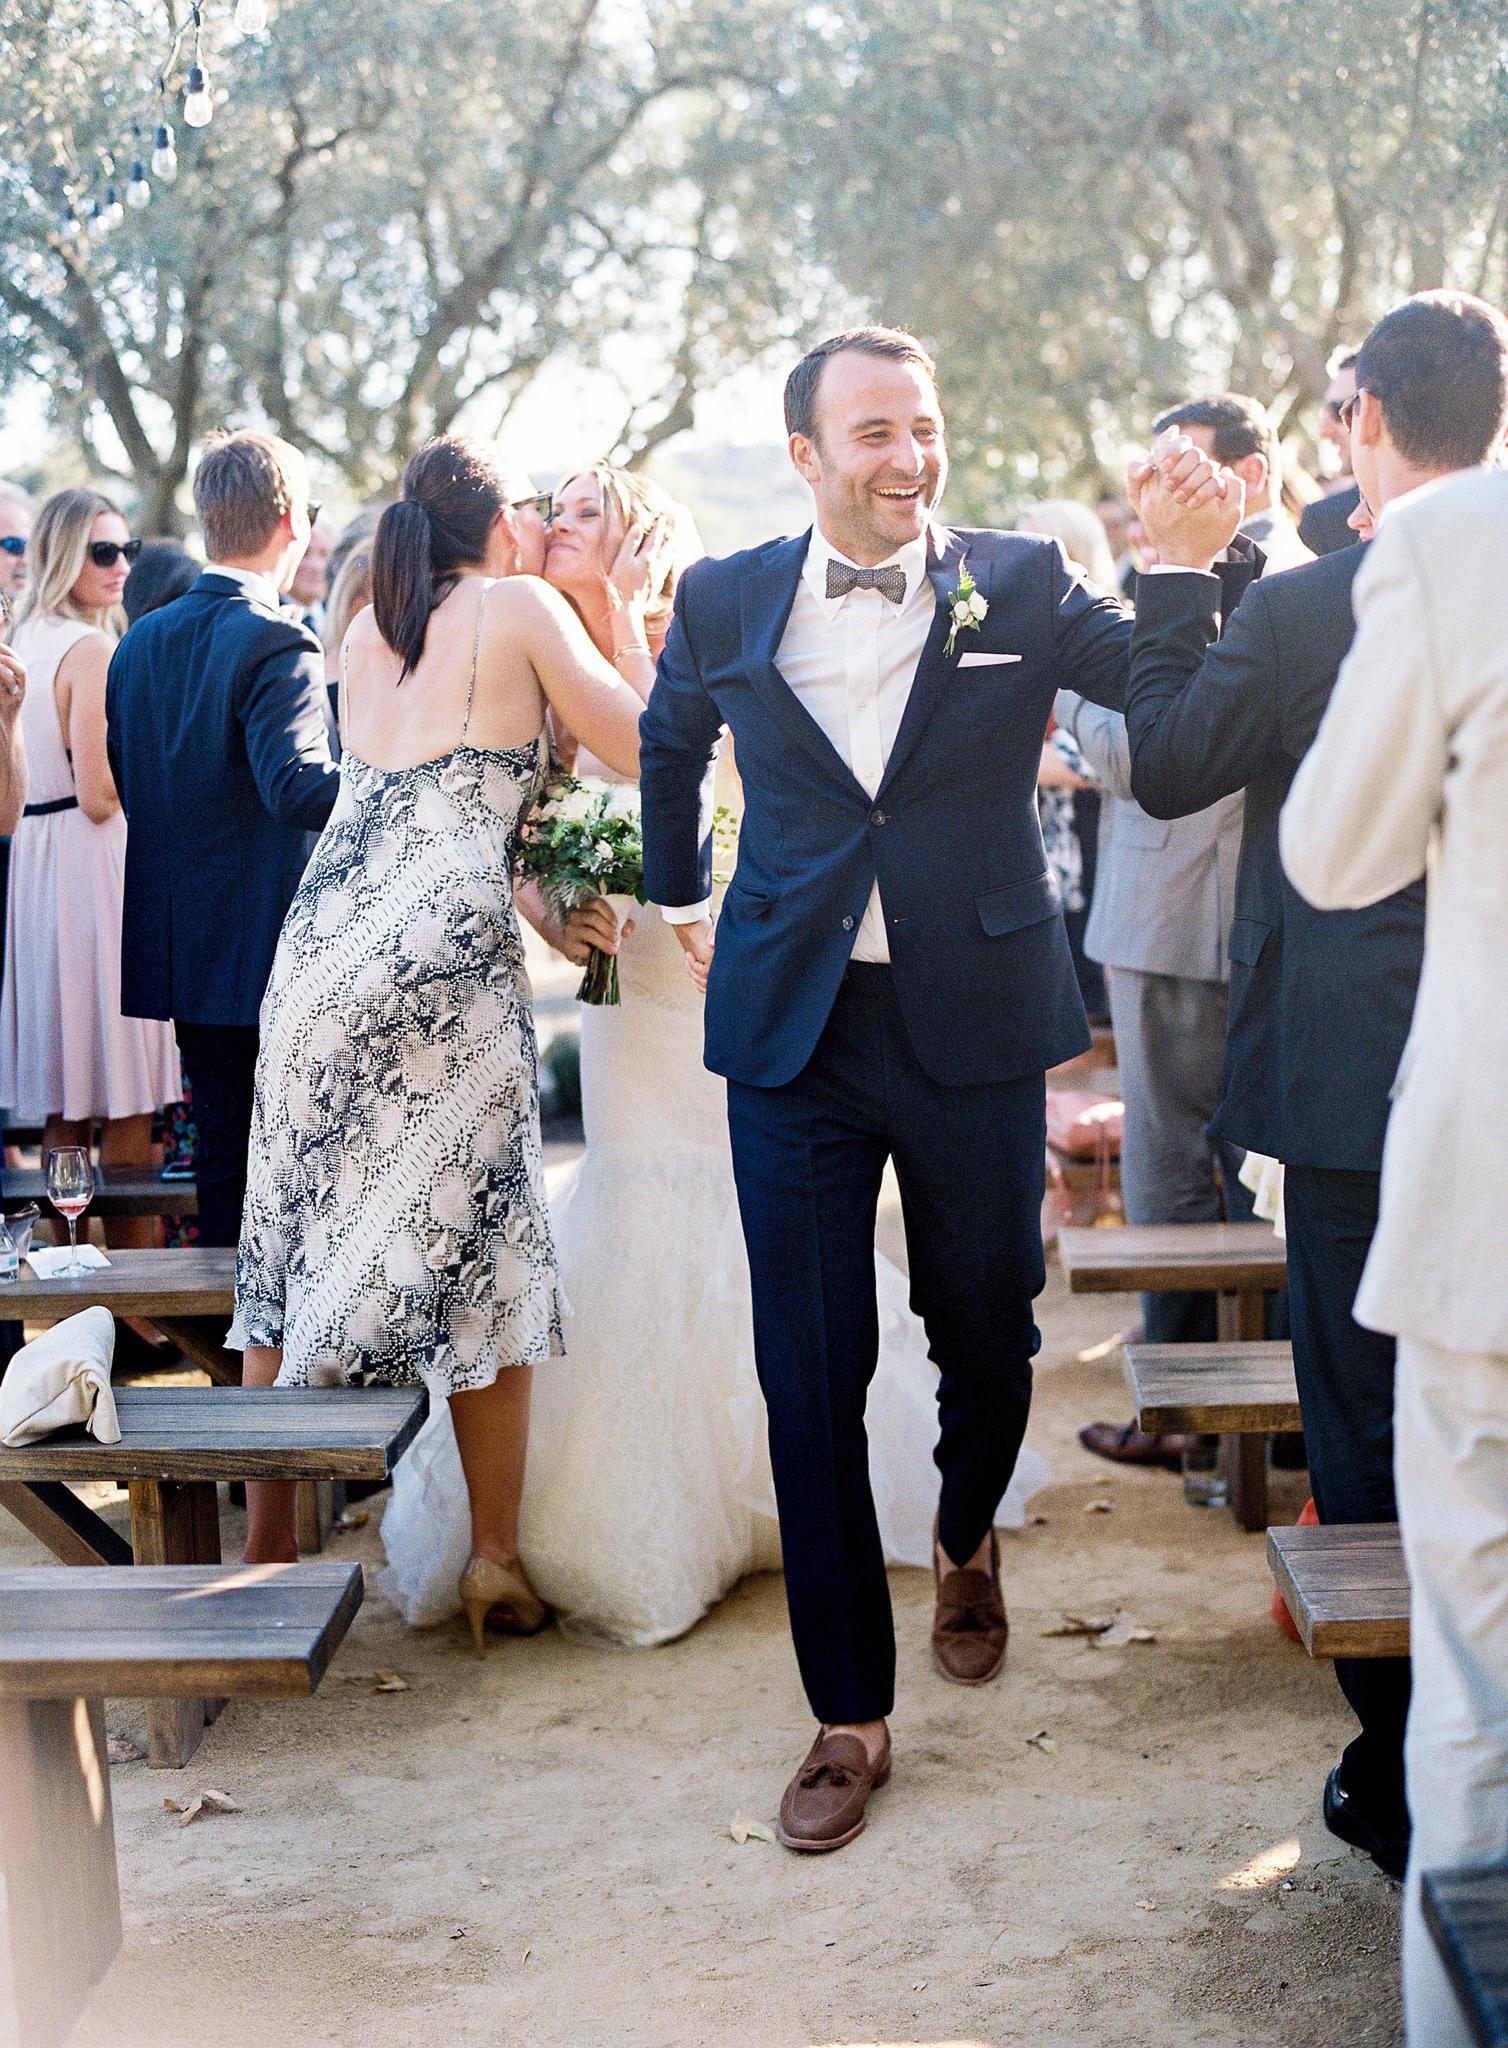 Meghan Mehan Photography - Fine Art Film Wedding Photography - San Francisco   Napa   Sonoma   Big Sur   Chicago   Minneapolis   Milwaukee   Lake Geneva   Door County   Wisconsin 028.jpg